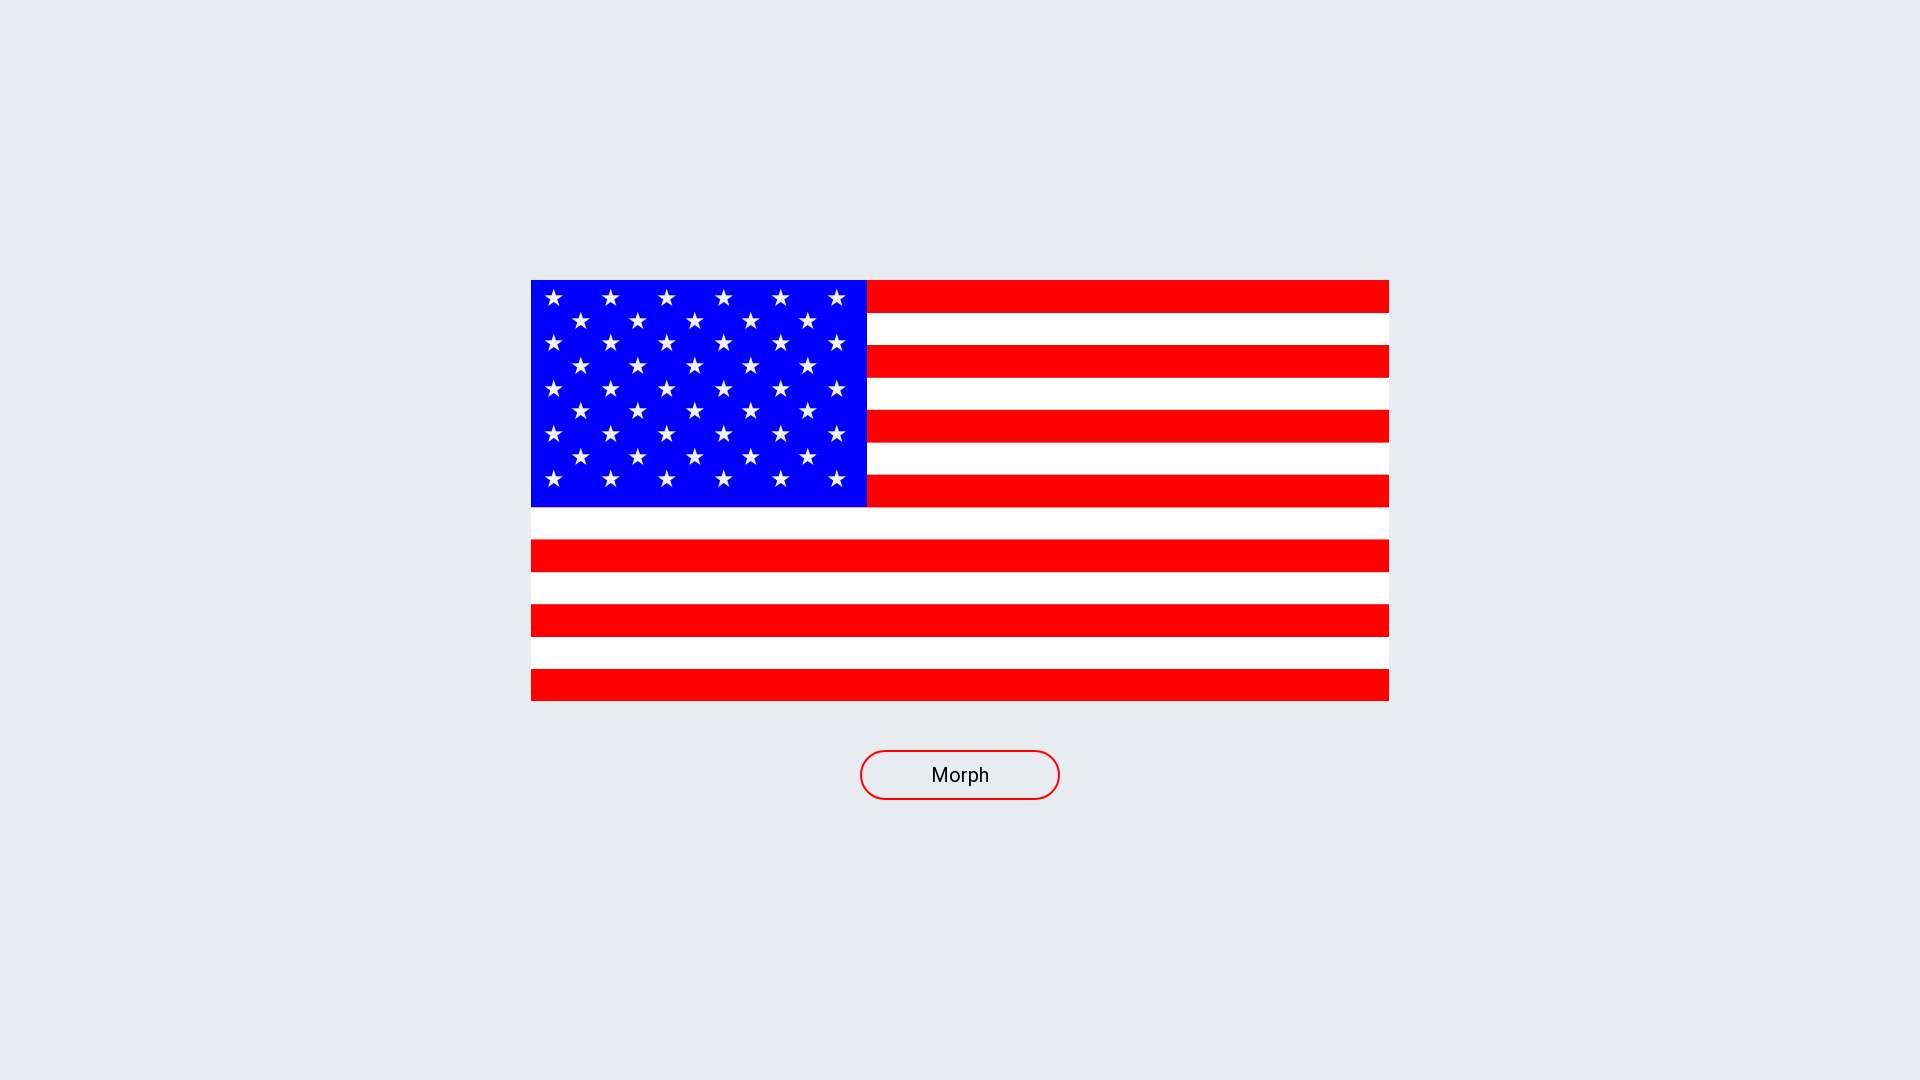 American flag morph